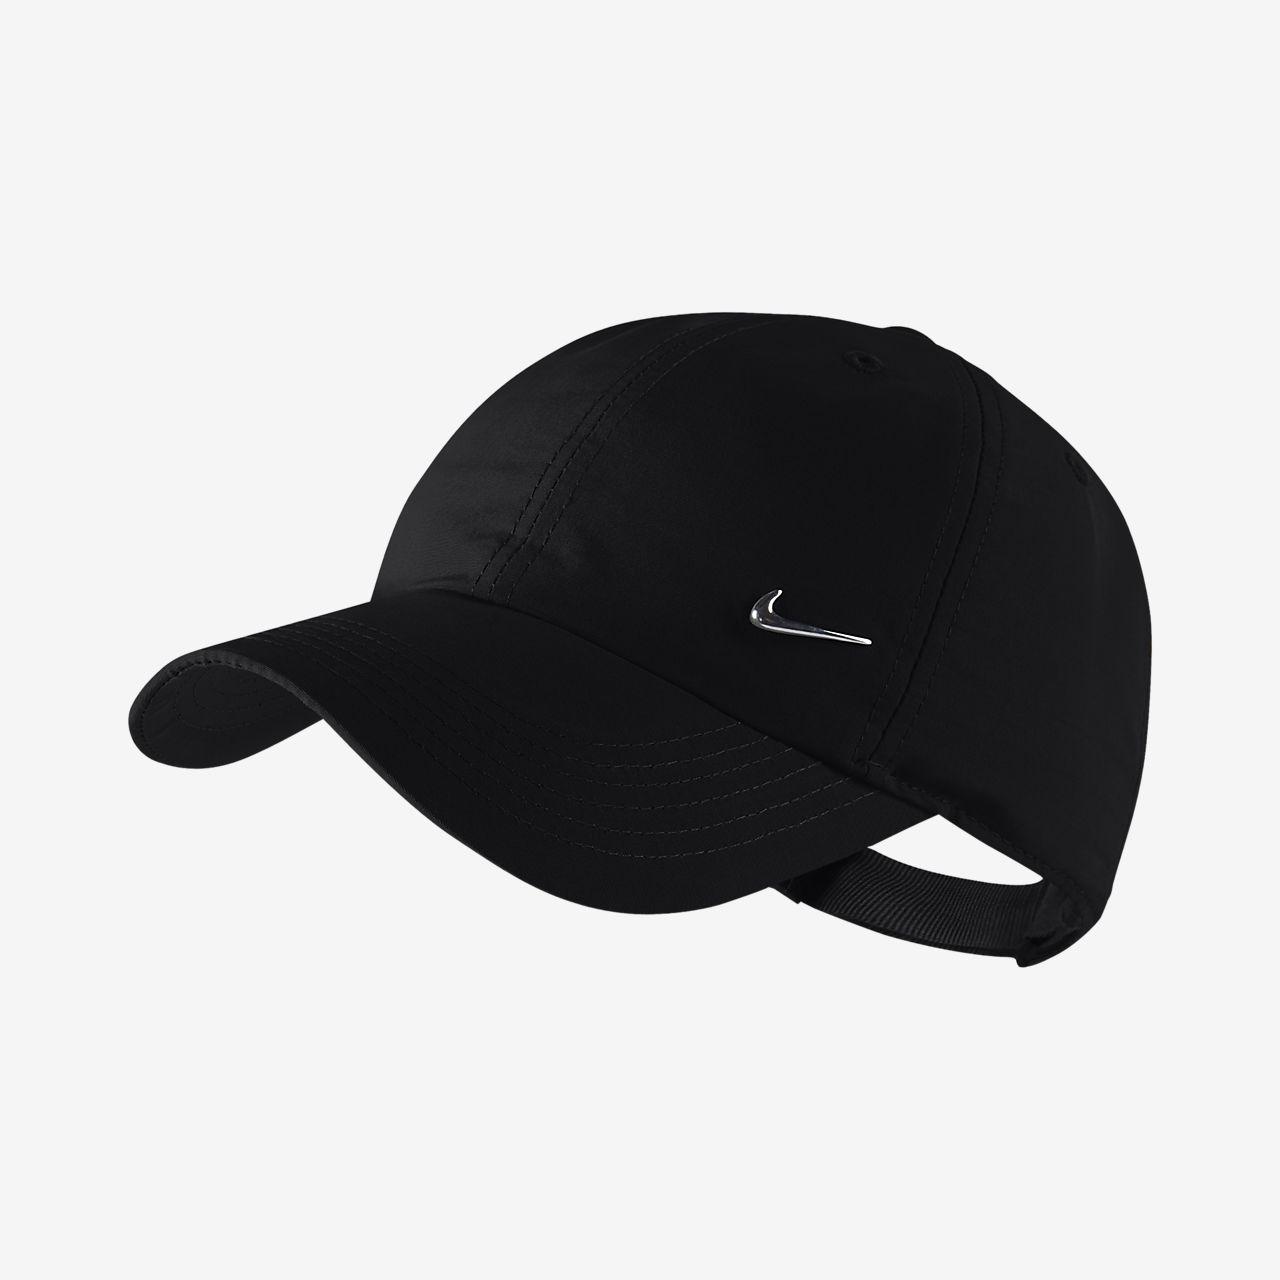 eeb226a18 Nike Metal Swoosh Big Kids' Adjustable Hat